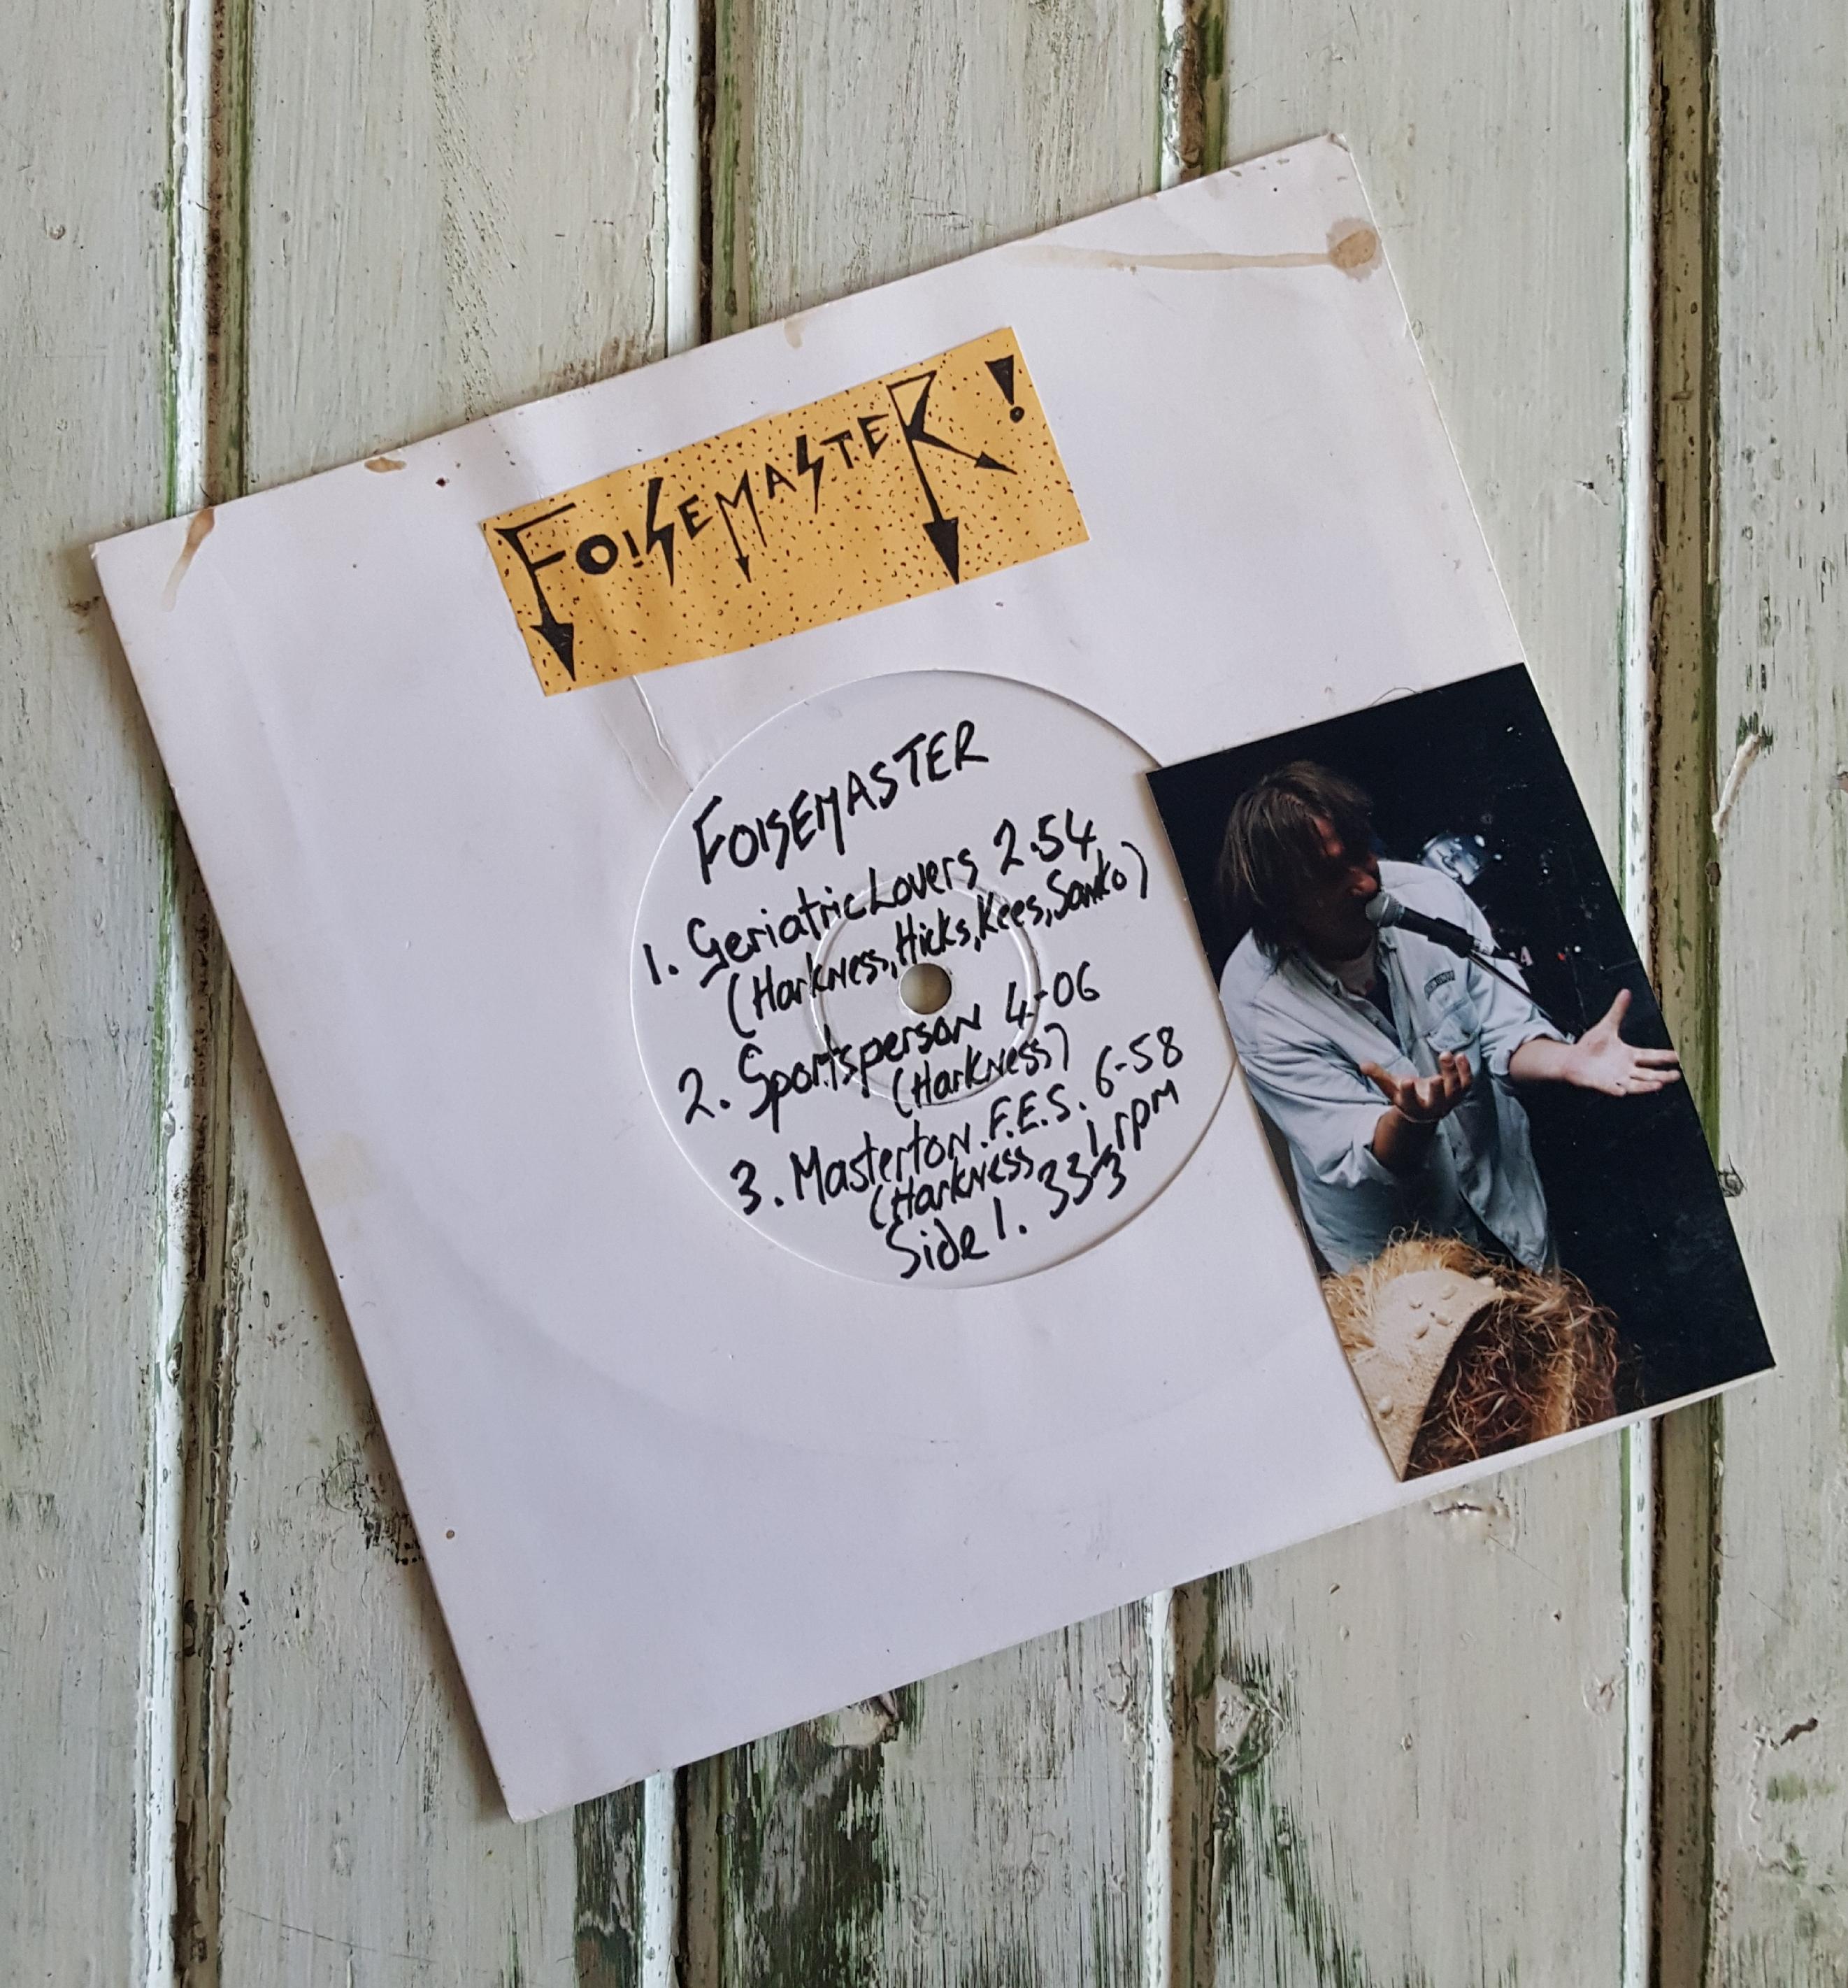 Foisemaster (limited Edition) 7inch Vinyl